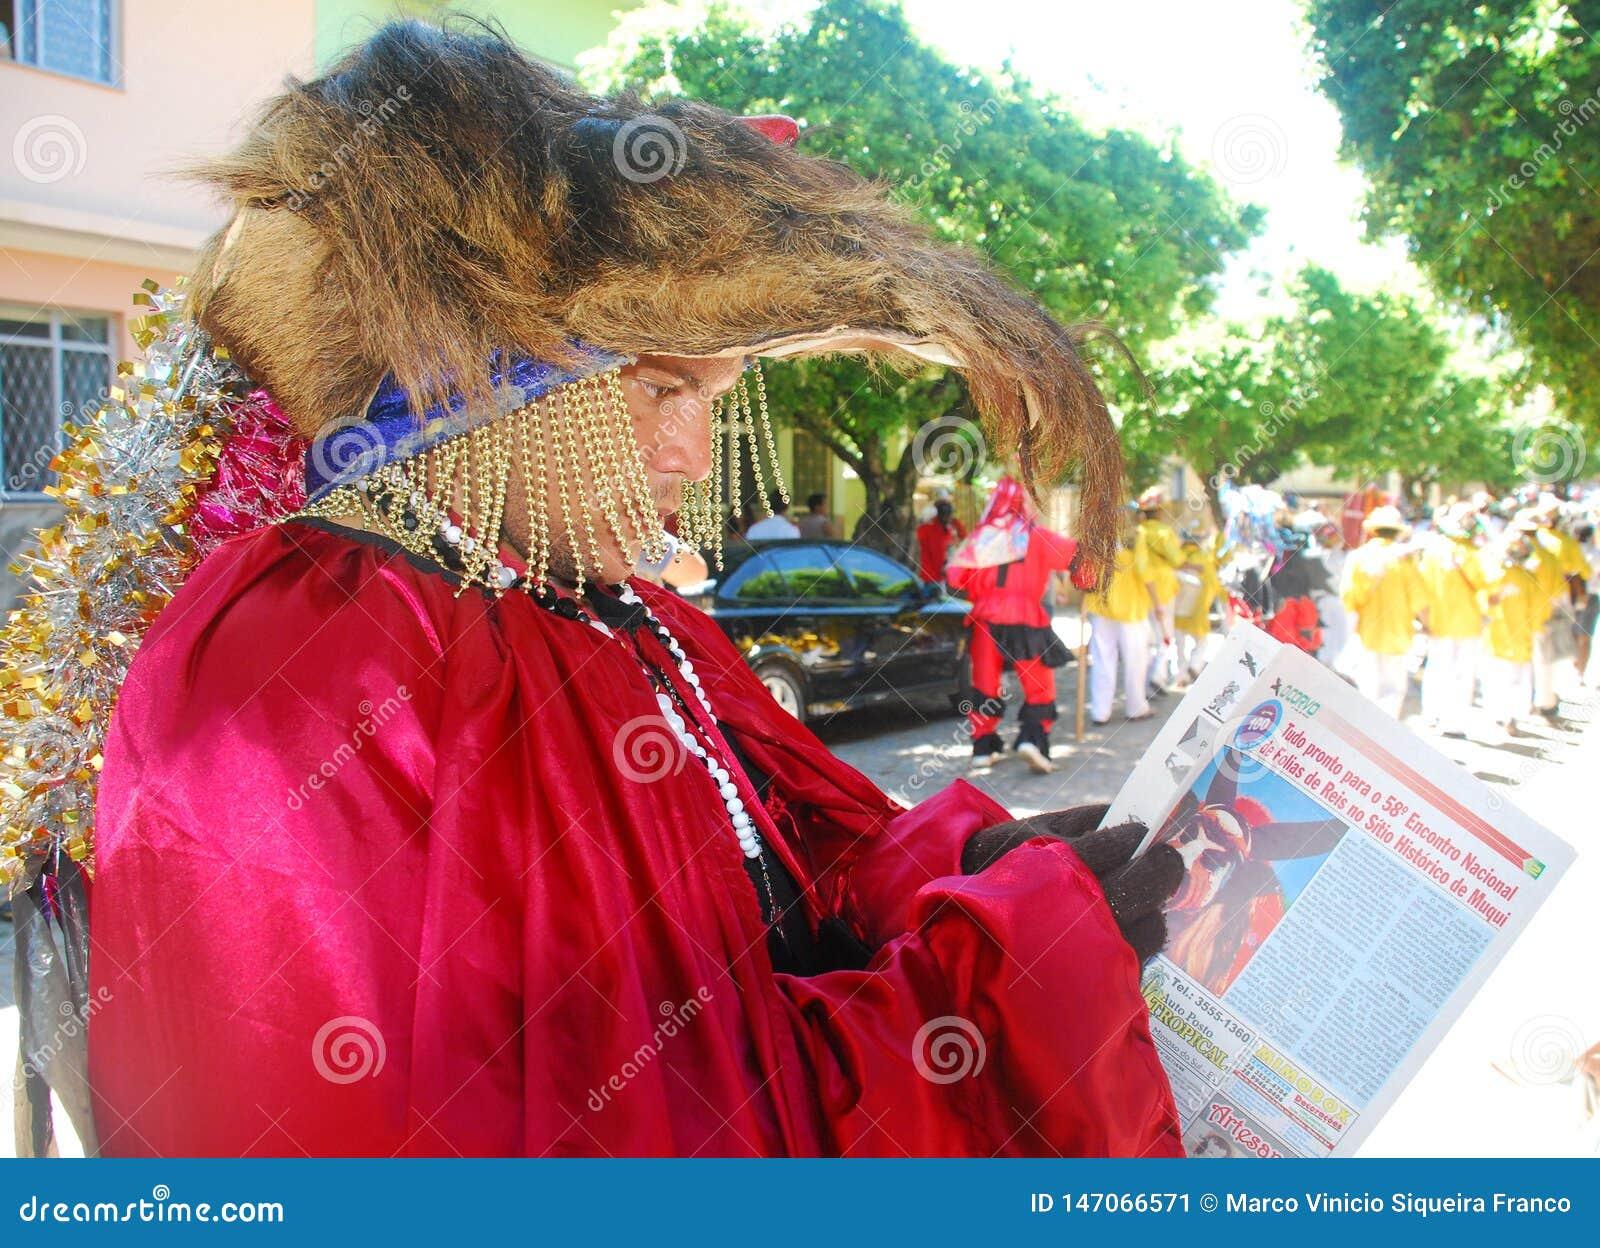 Folia De Reis w Brazil_07